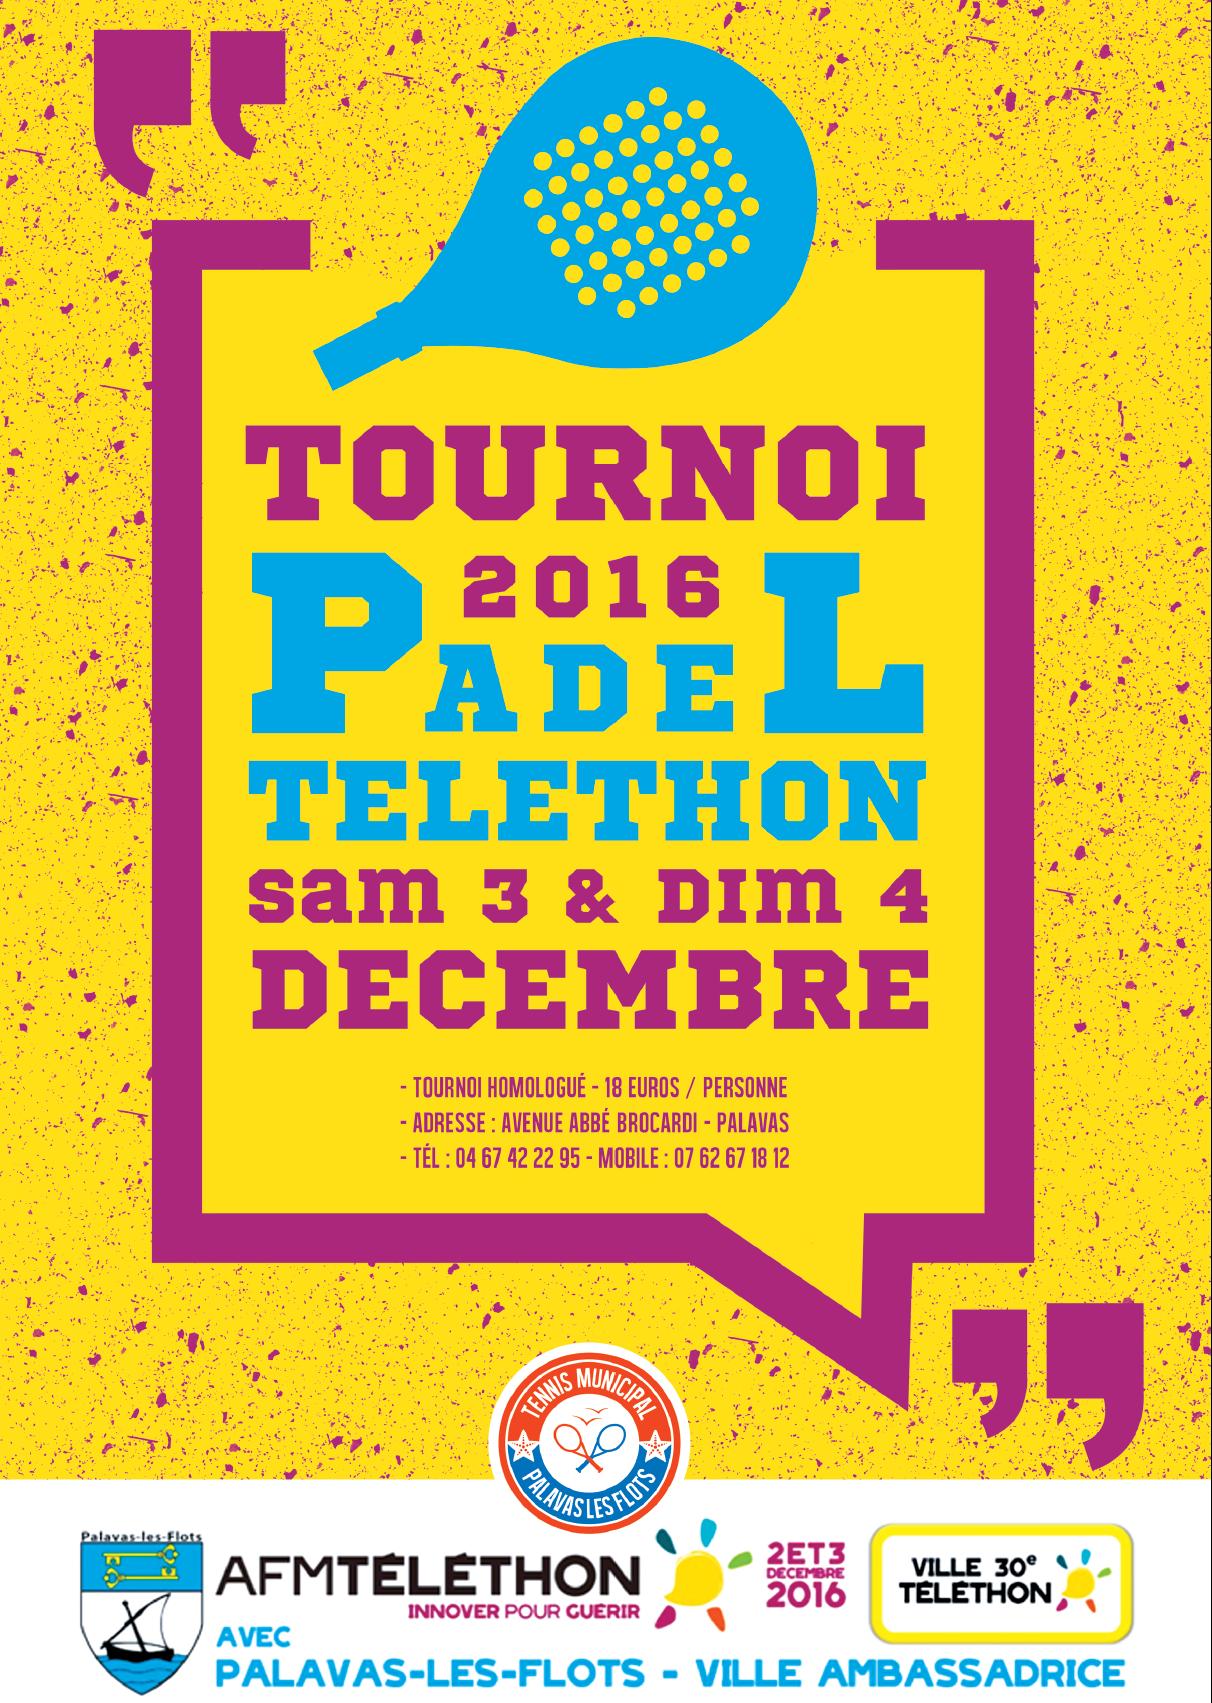 tournoi-palavas-padel-decembre-2016